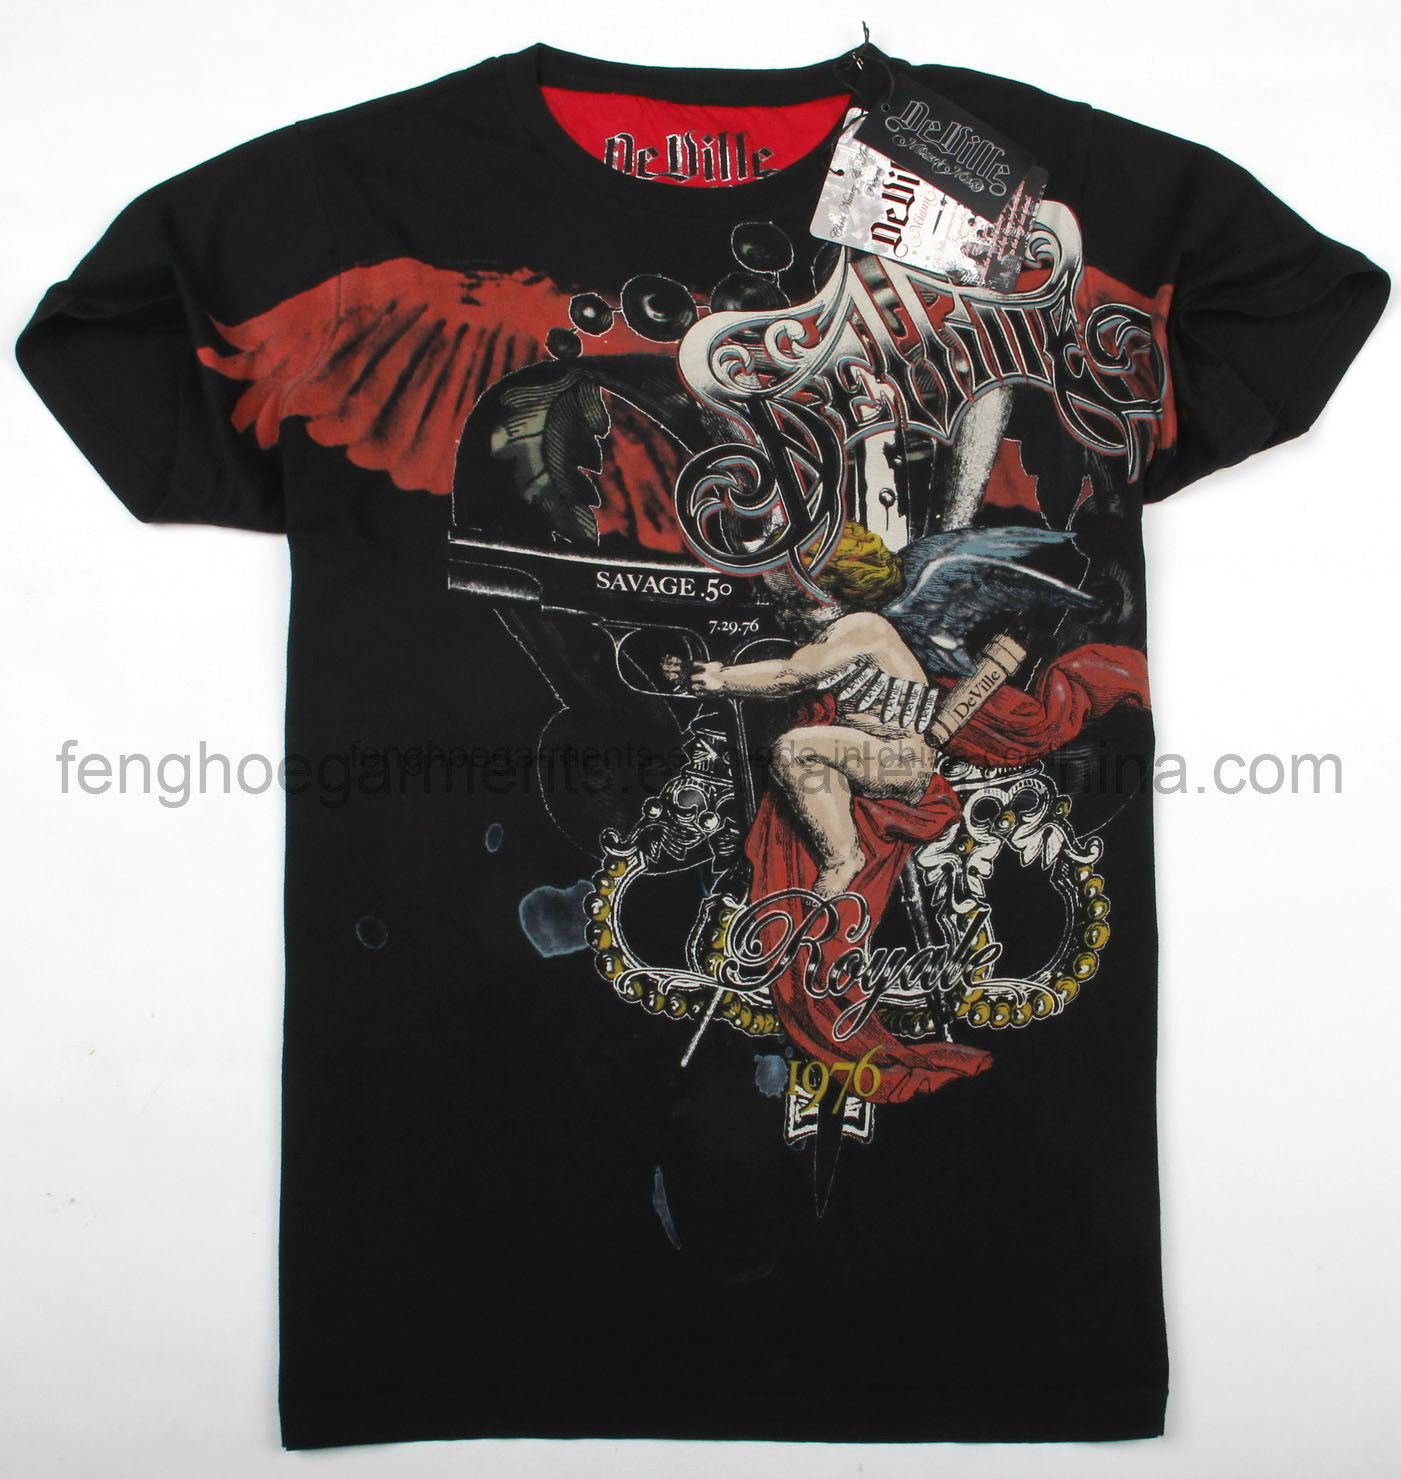 China printed t shirt custom t shirt brand t shirt for Designer t shirts brands